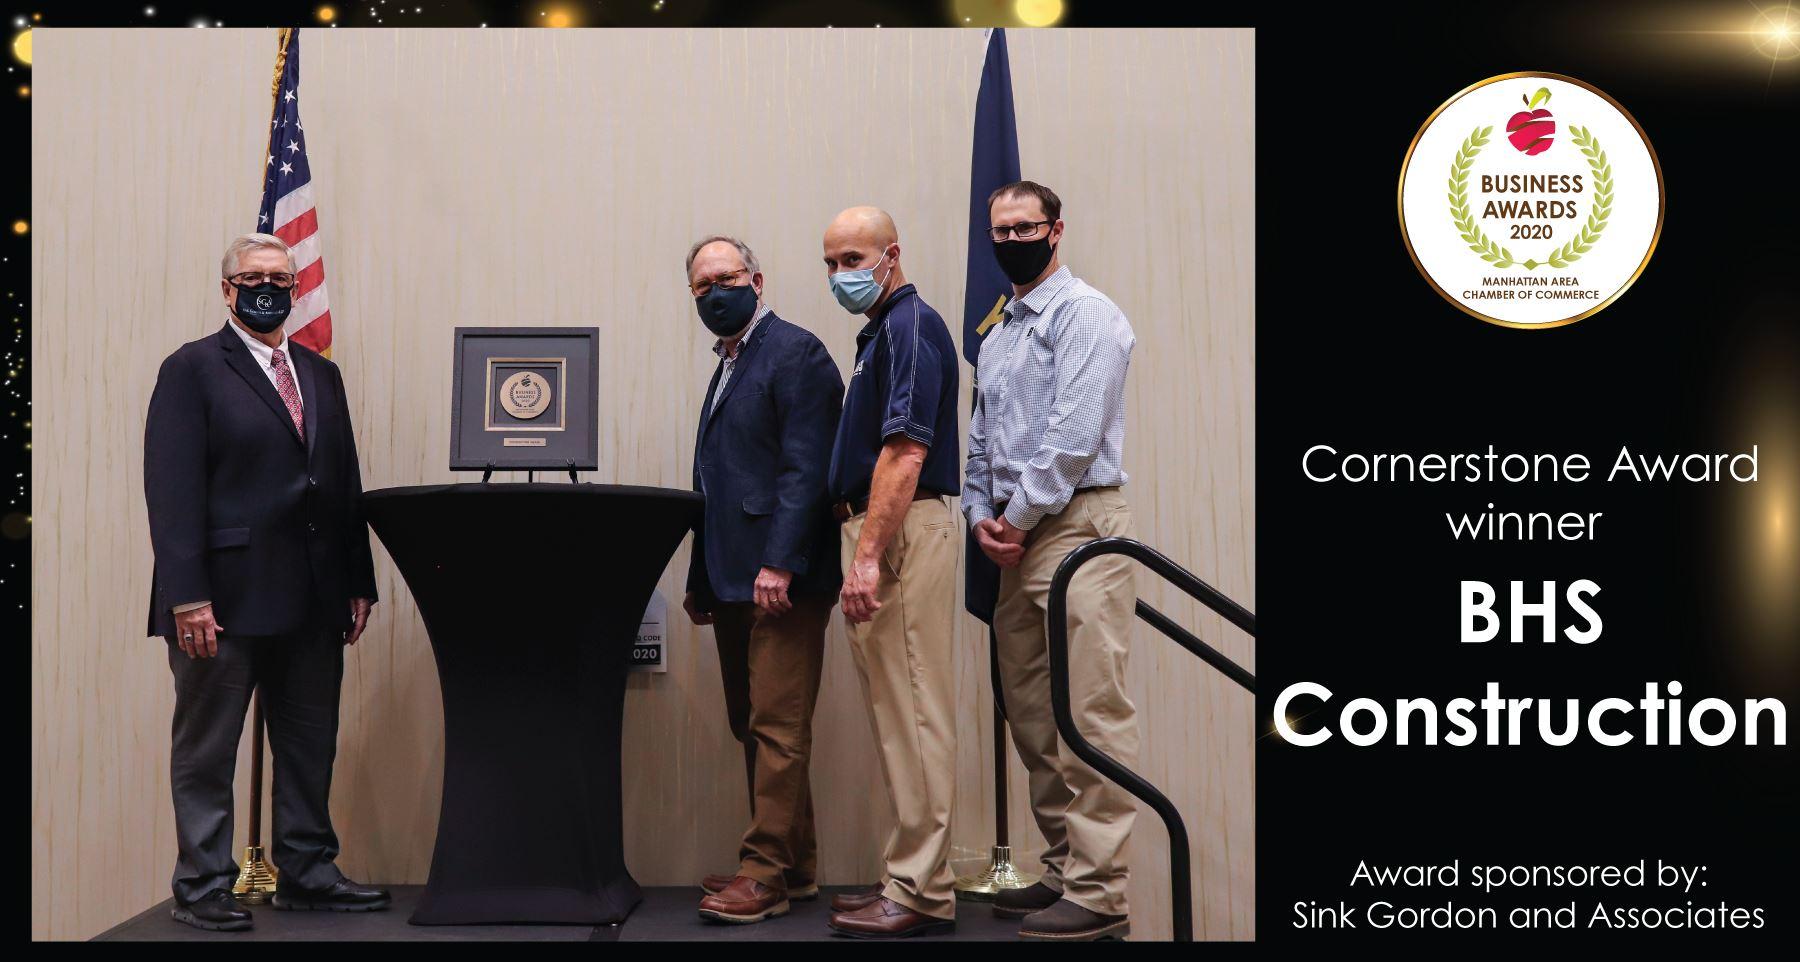 BHS Construction Receiving Cornerstone Award